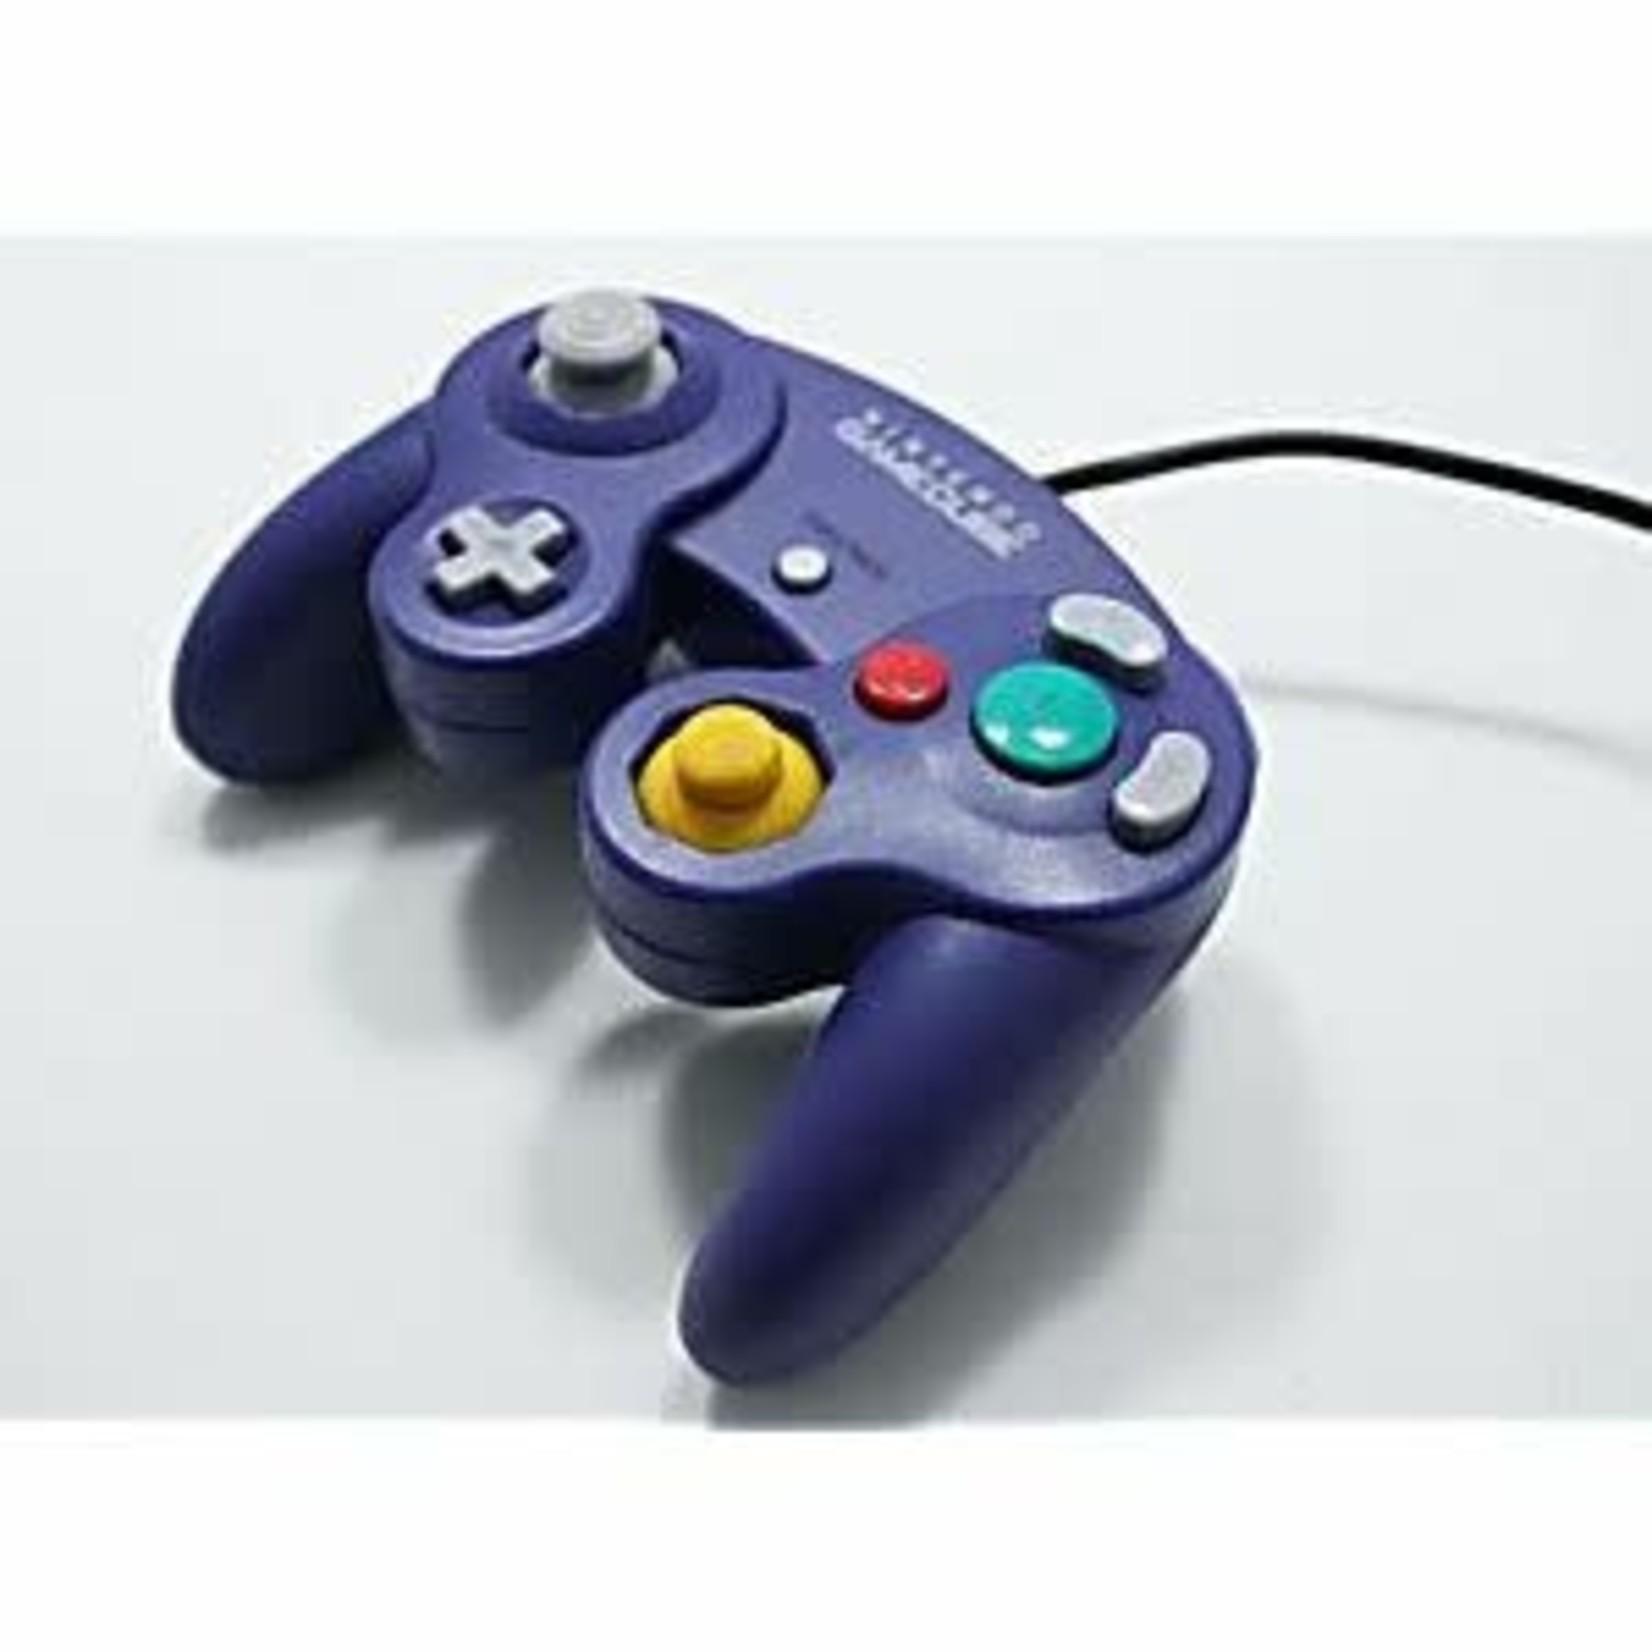 GCU-USED GAMECUBE CONTROLLER(OFFICIAL)